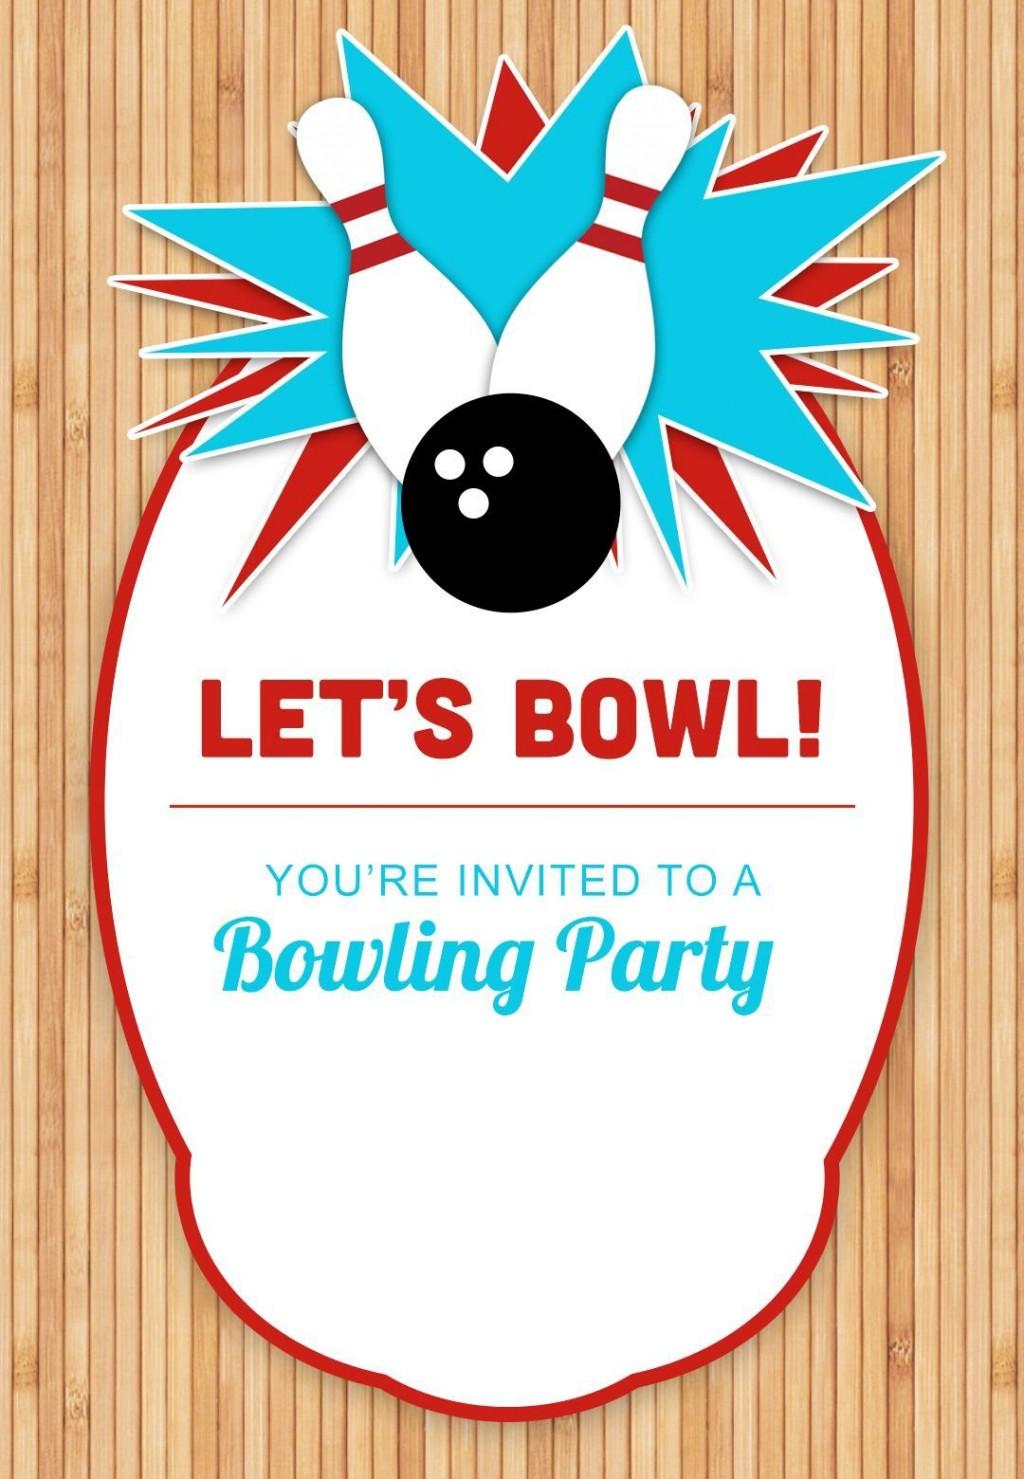 003 Marvelou Bowling Party Invite Printable Free Sample  Birthday InvitationLarge